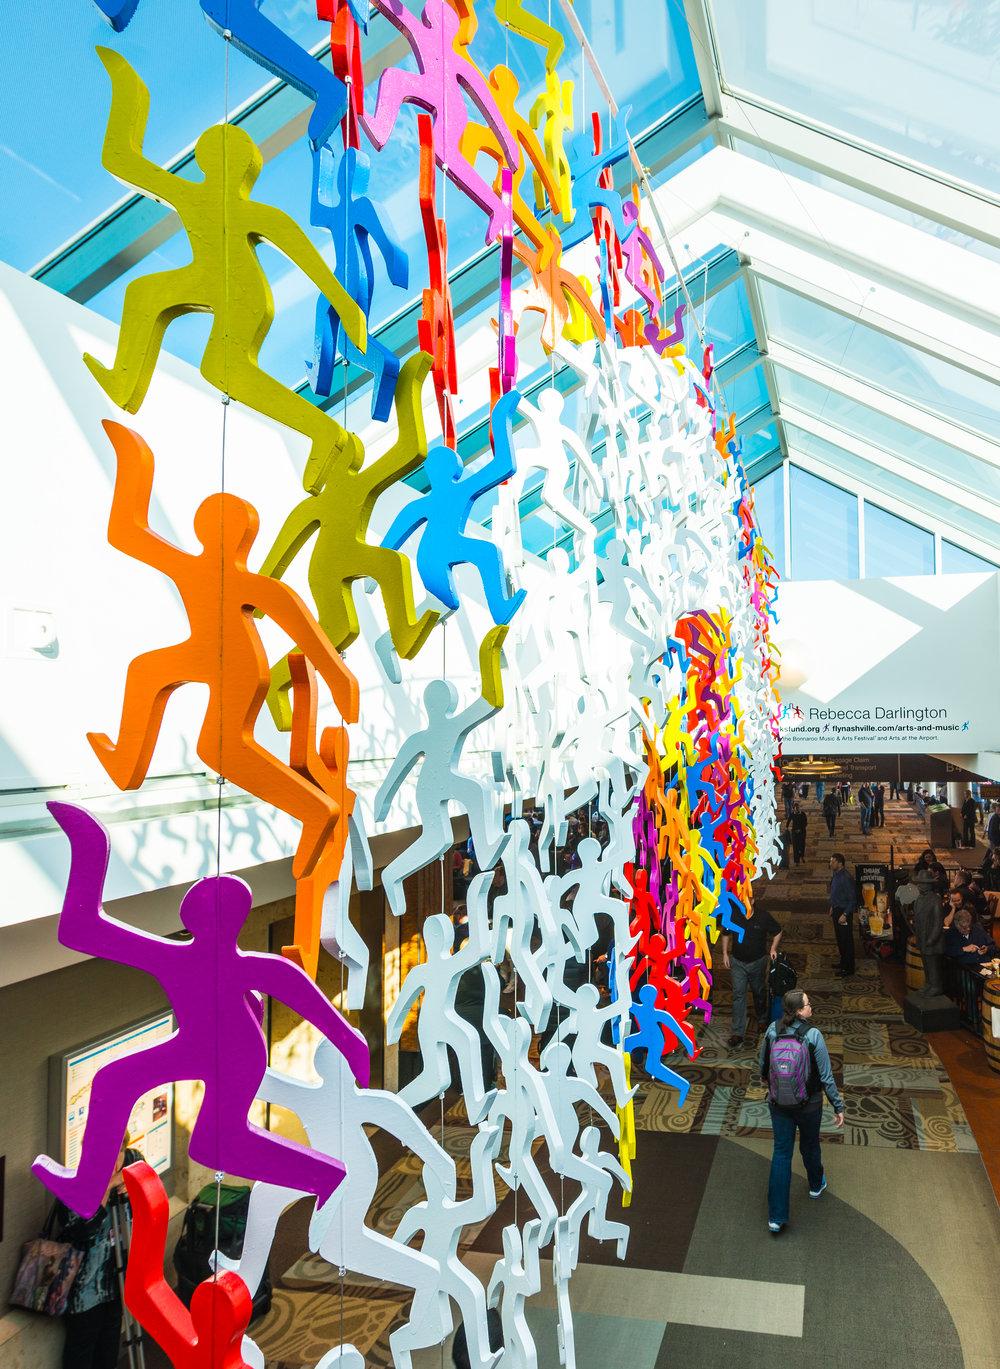 Play as a Team - Nashville International Airport Installation2018-19